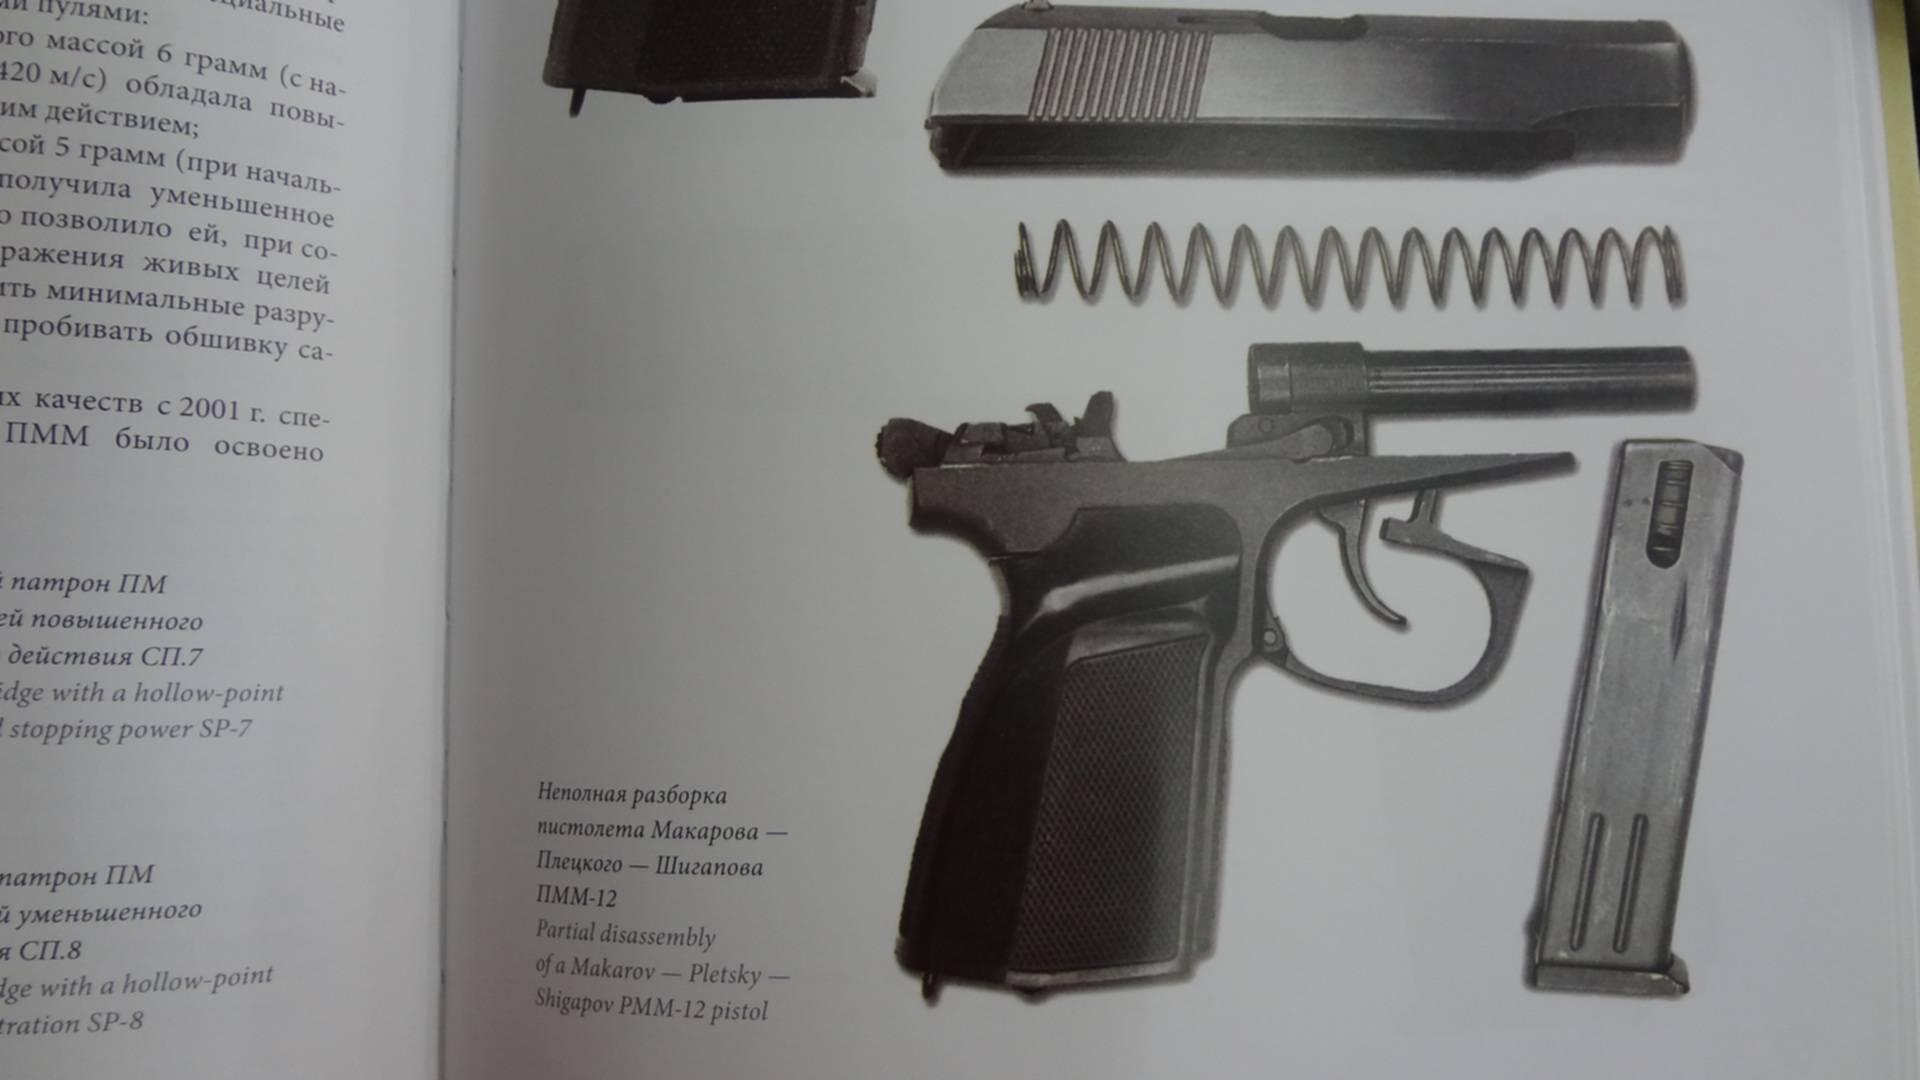 Пистолет макарова — википедия переиздание // wiki 2